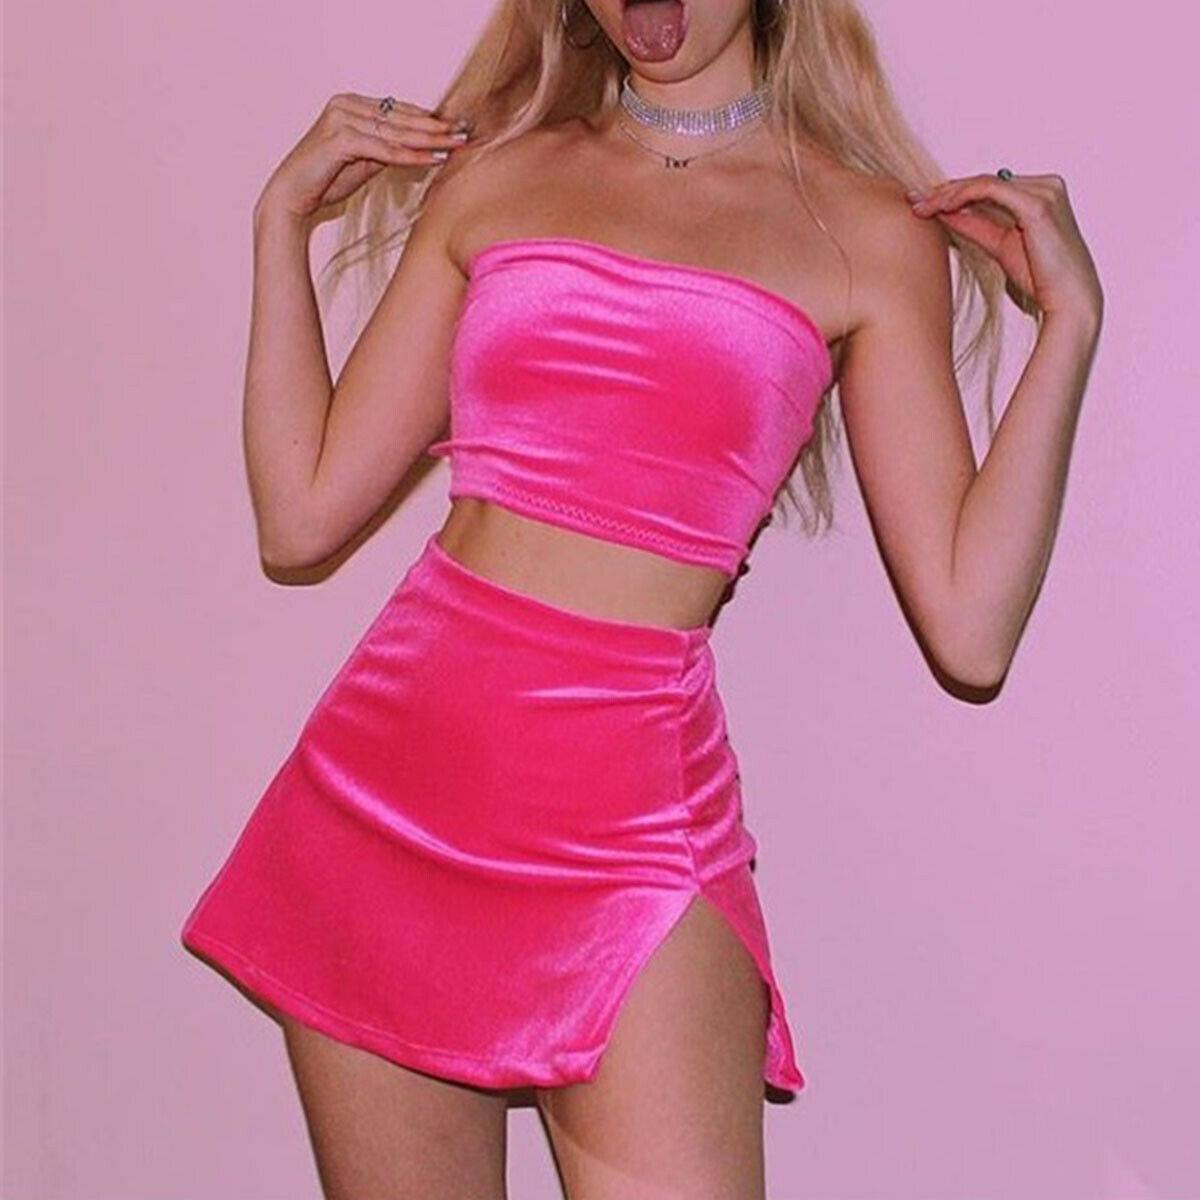 2pcs set Women Holiday Adjustable Spaghetti Strap Crop Tops High Waist Bodycon Skirt Set Ladies Summer Beach Party wear Outfits